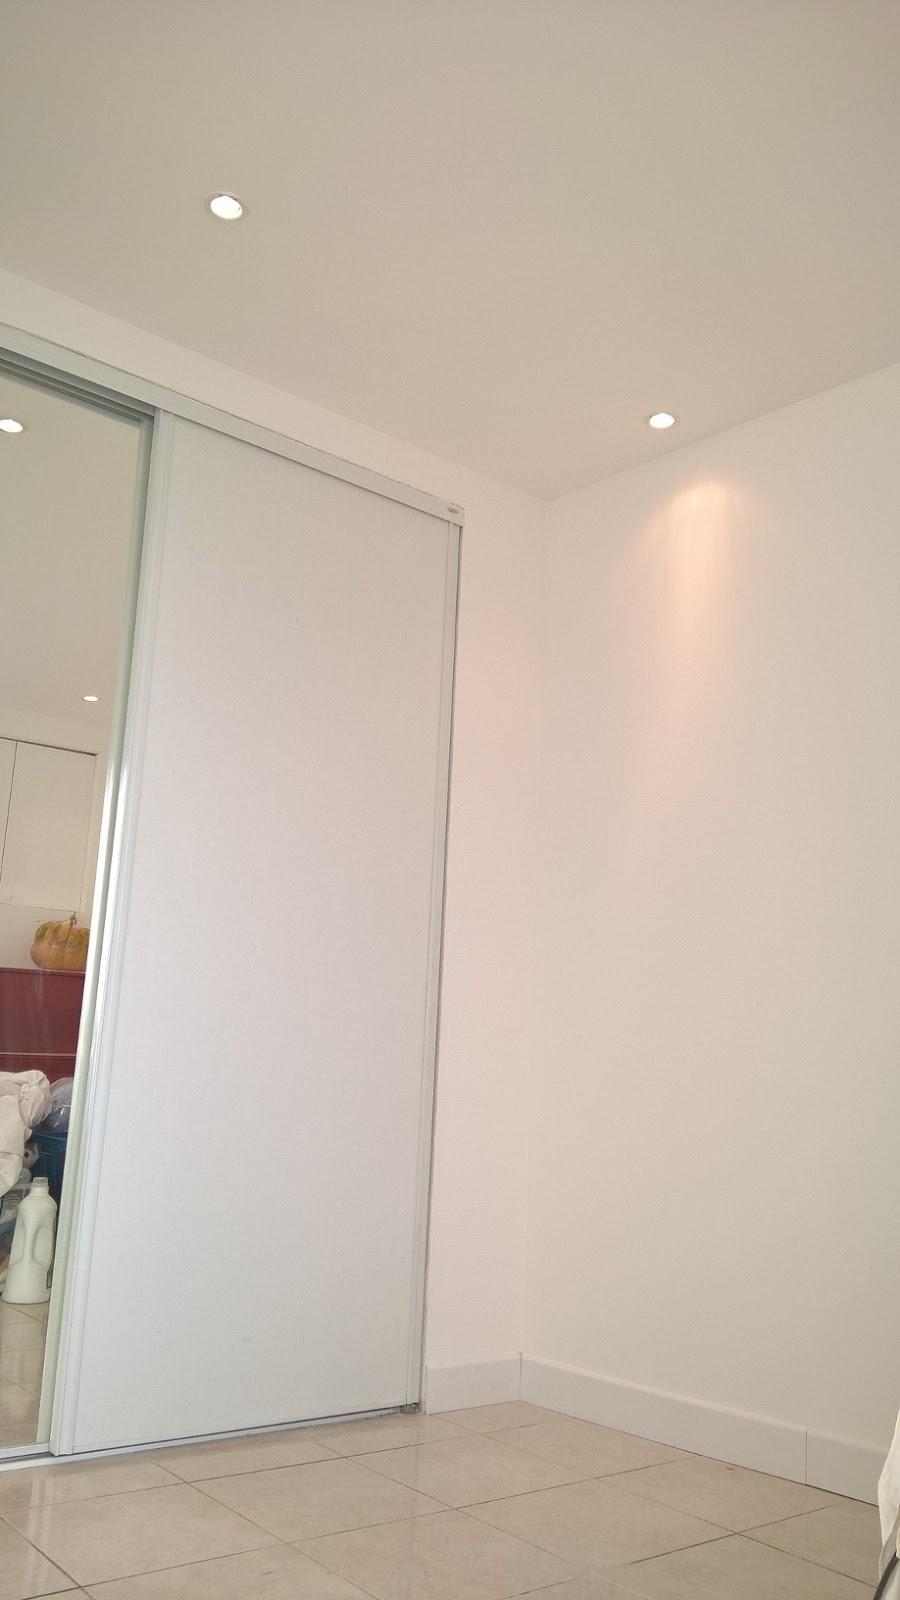 Plinthe plafond plinthe plafond cache fils plafond avec for Double plafond suspendu